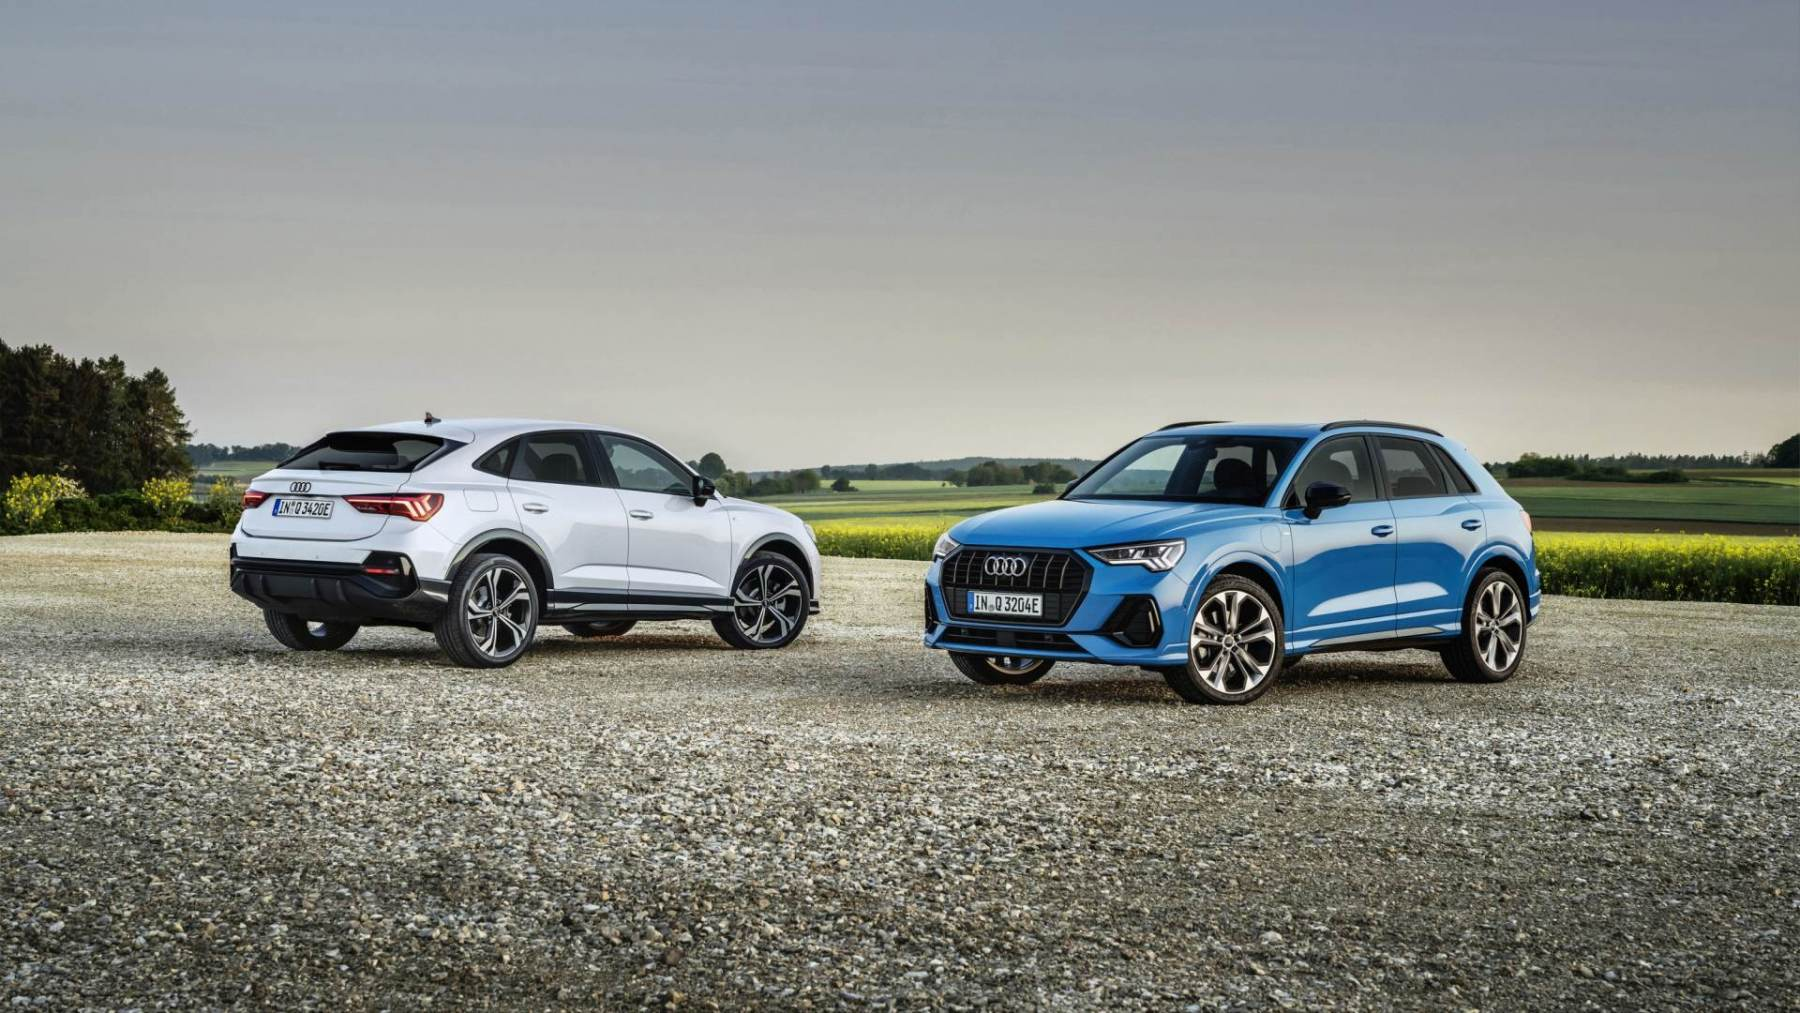 Audi Q3 TFSI plug-in hybrid 2021